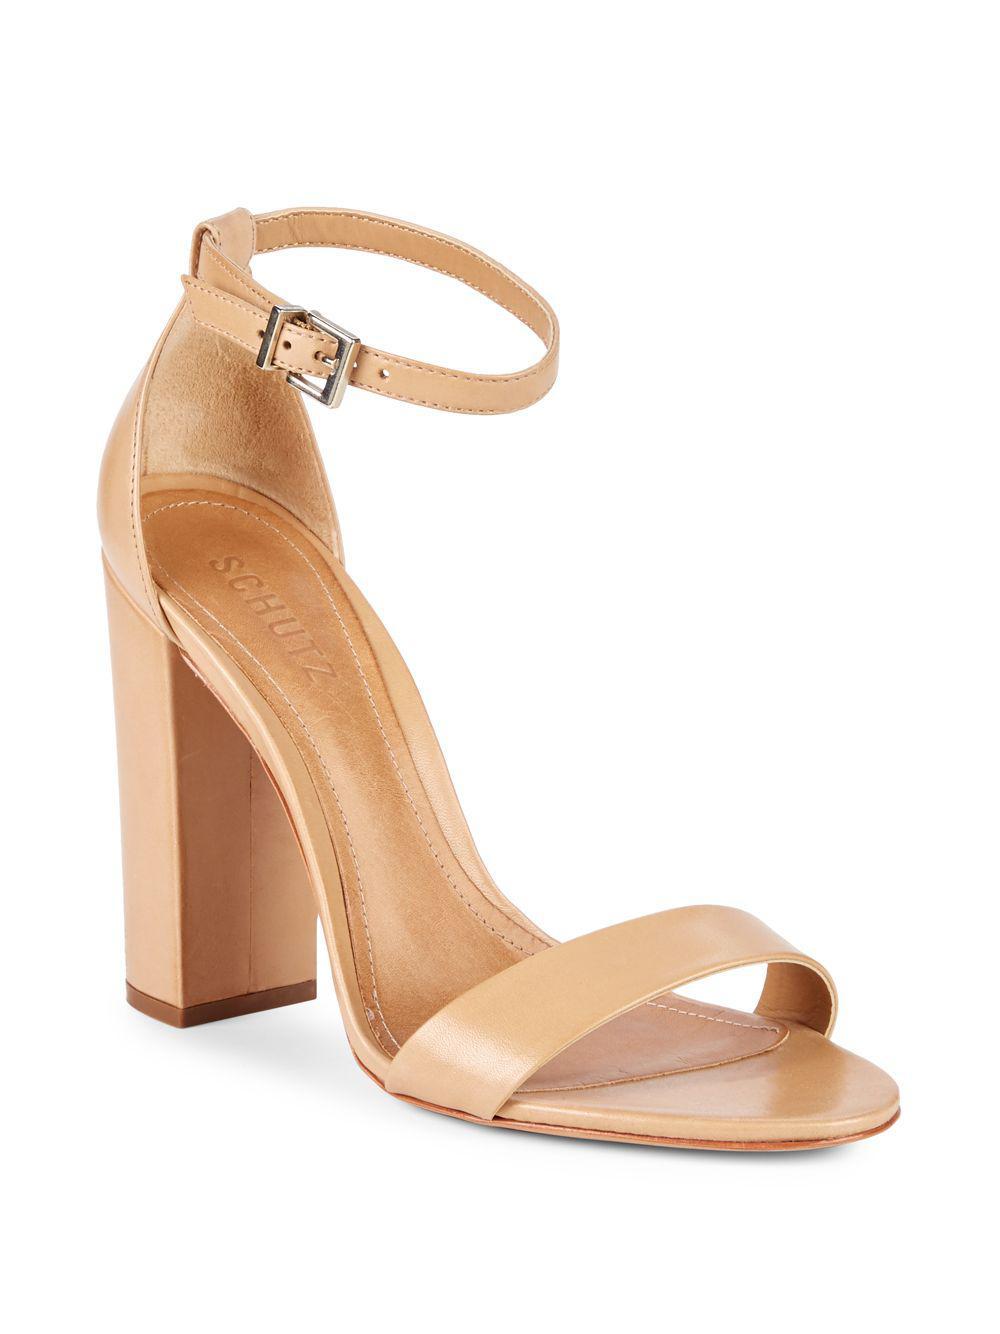 Schutz Women's Enida Suede Block Heel Ankle Strap Sandals y0qBkh6rrz